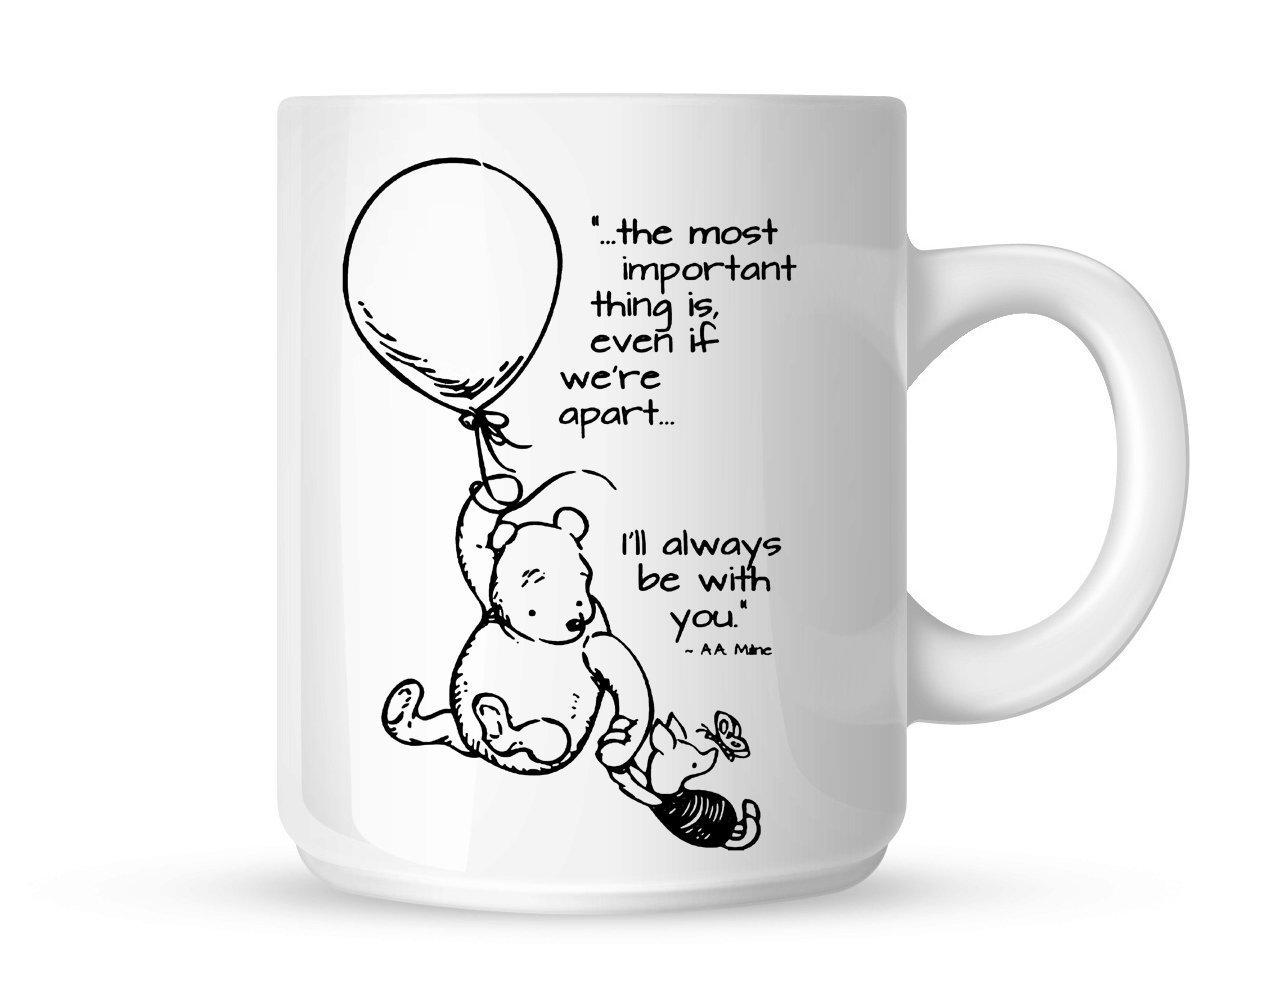 1264x1004 Winnie The Pooh Love Quotes Mug White Mug 11oz Amazon.co.uk